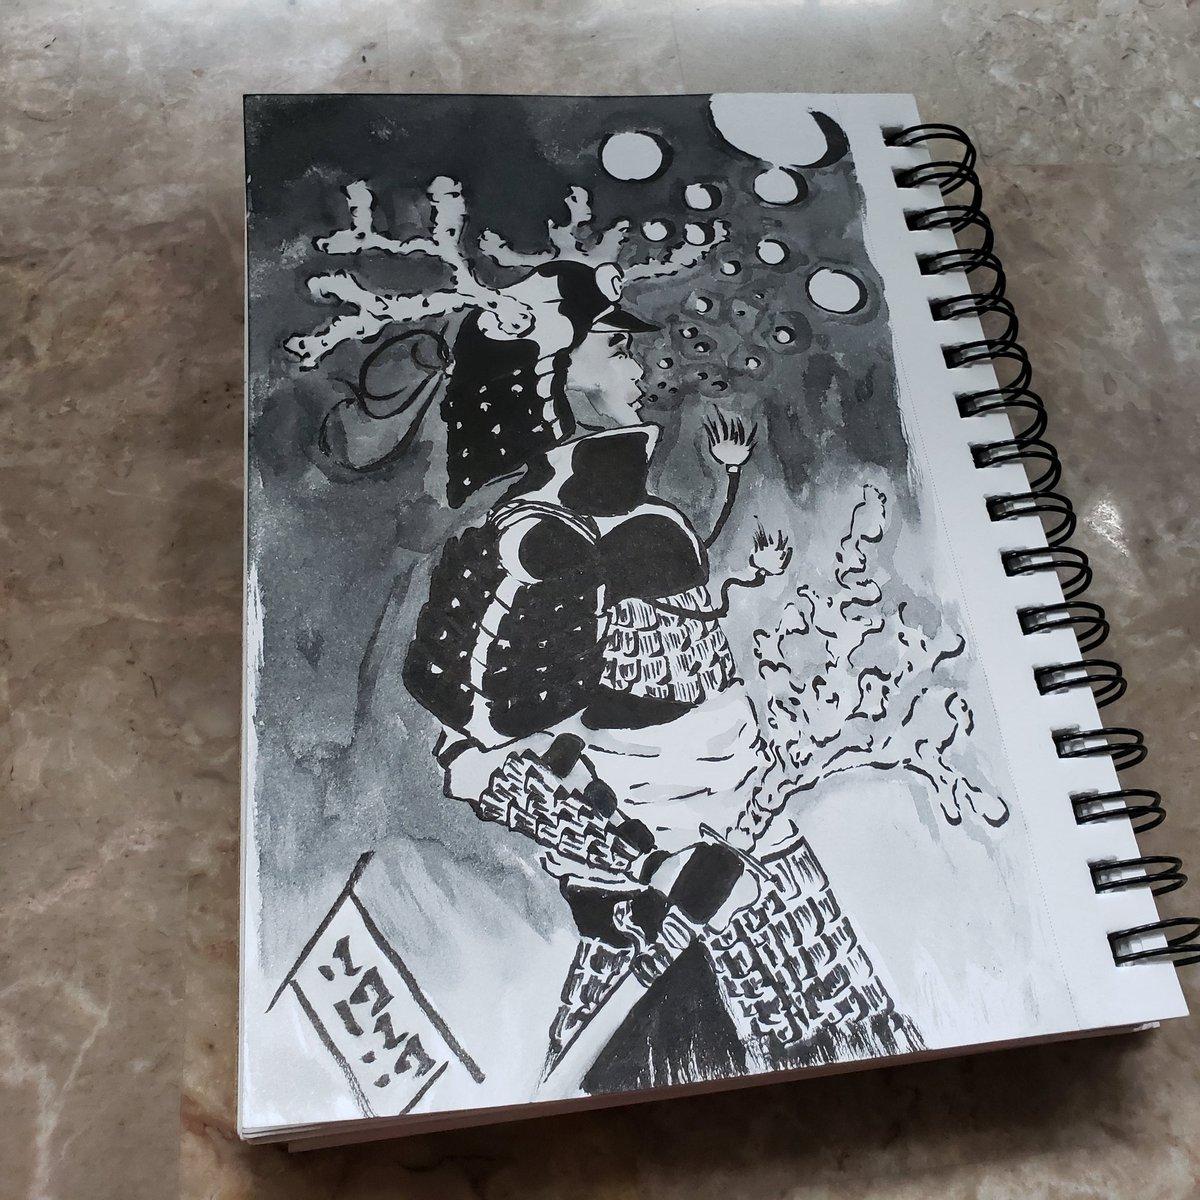 Inktober Day 20 & 14: Coral and Armor. One brush. . . #Inktober #inktober2020 #inktober2020day20 #inktobercoral #ink #drawing #drawingwhileblack #blackartist #illustration #artistontwittter https://t.co/SA9oLl7afl